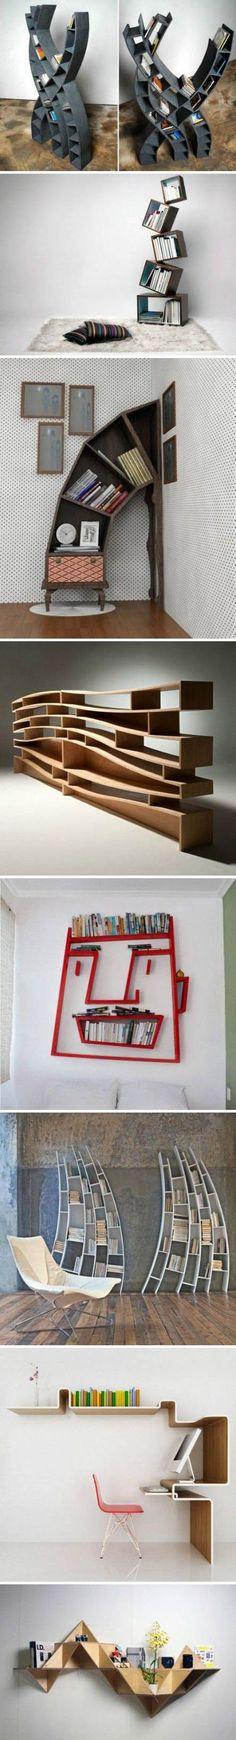 Cool Bookshelf   DIY Crafts Tutorials: